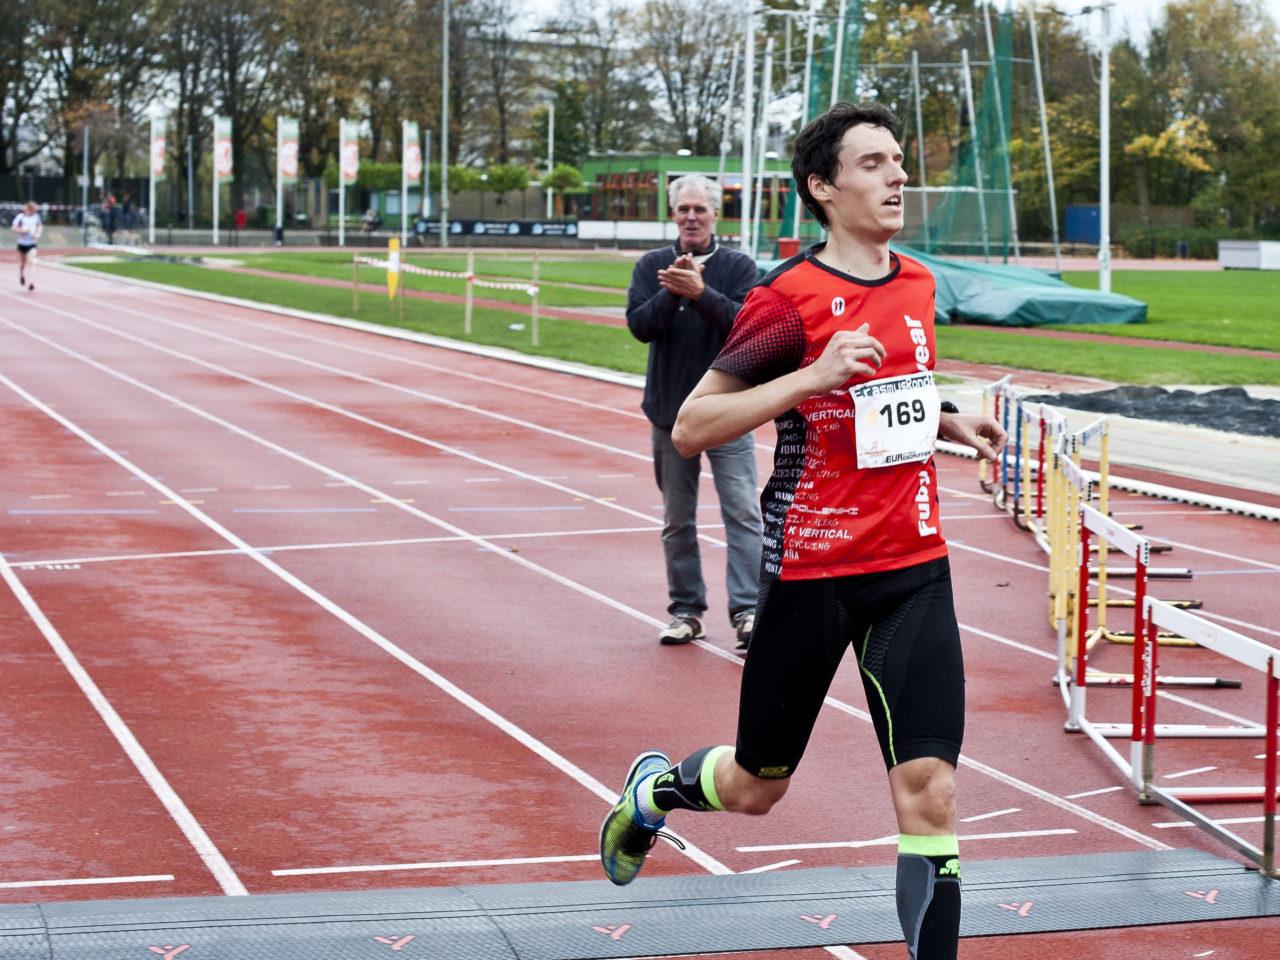 Erasmusronde NSK 2015 (5)